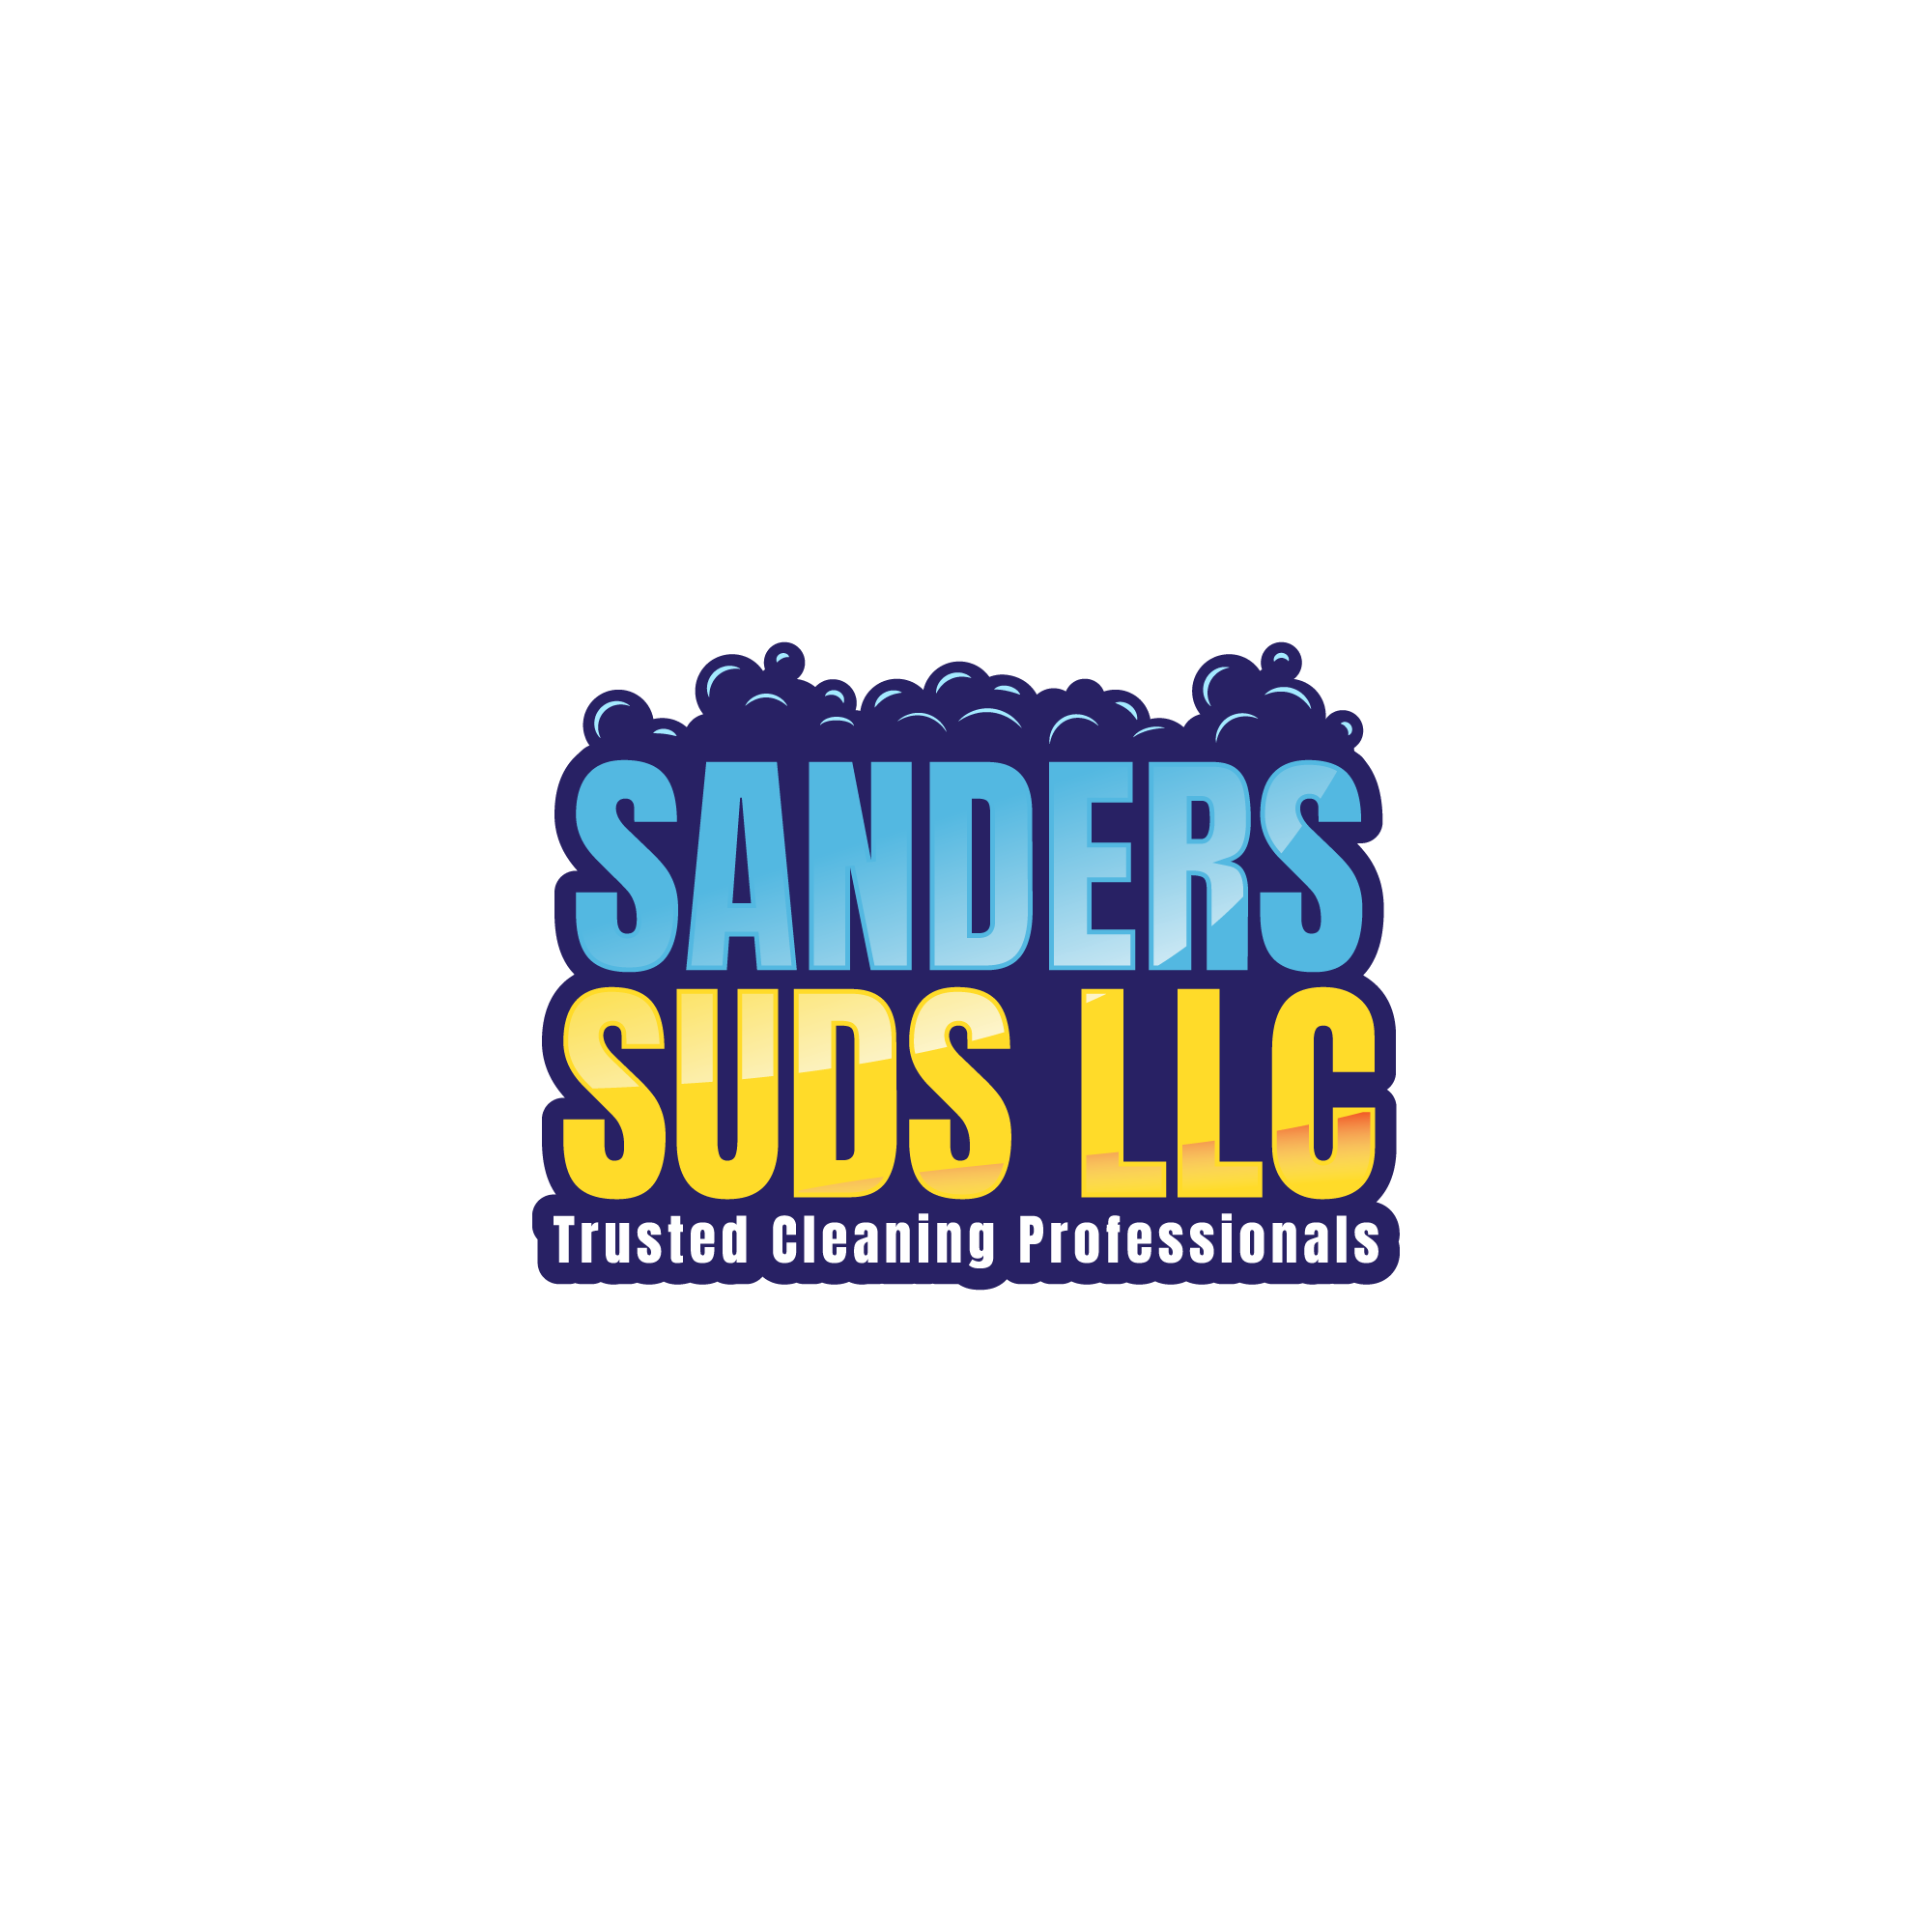 Sanders Suds LLC logo